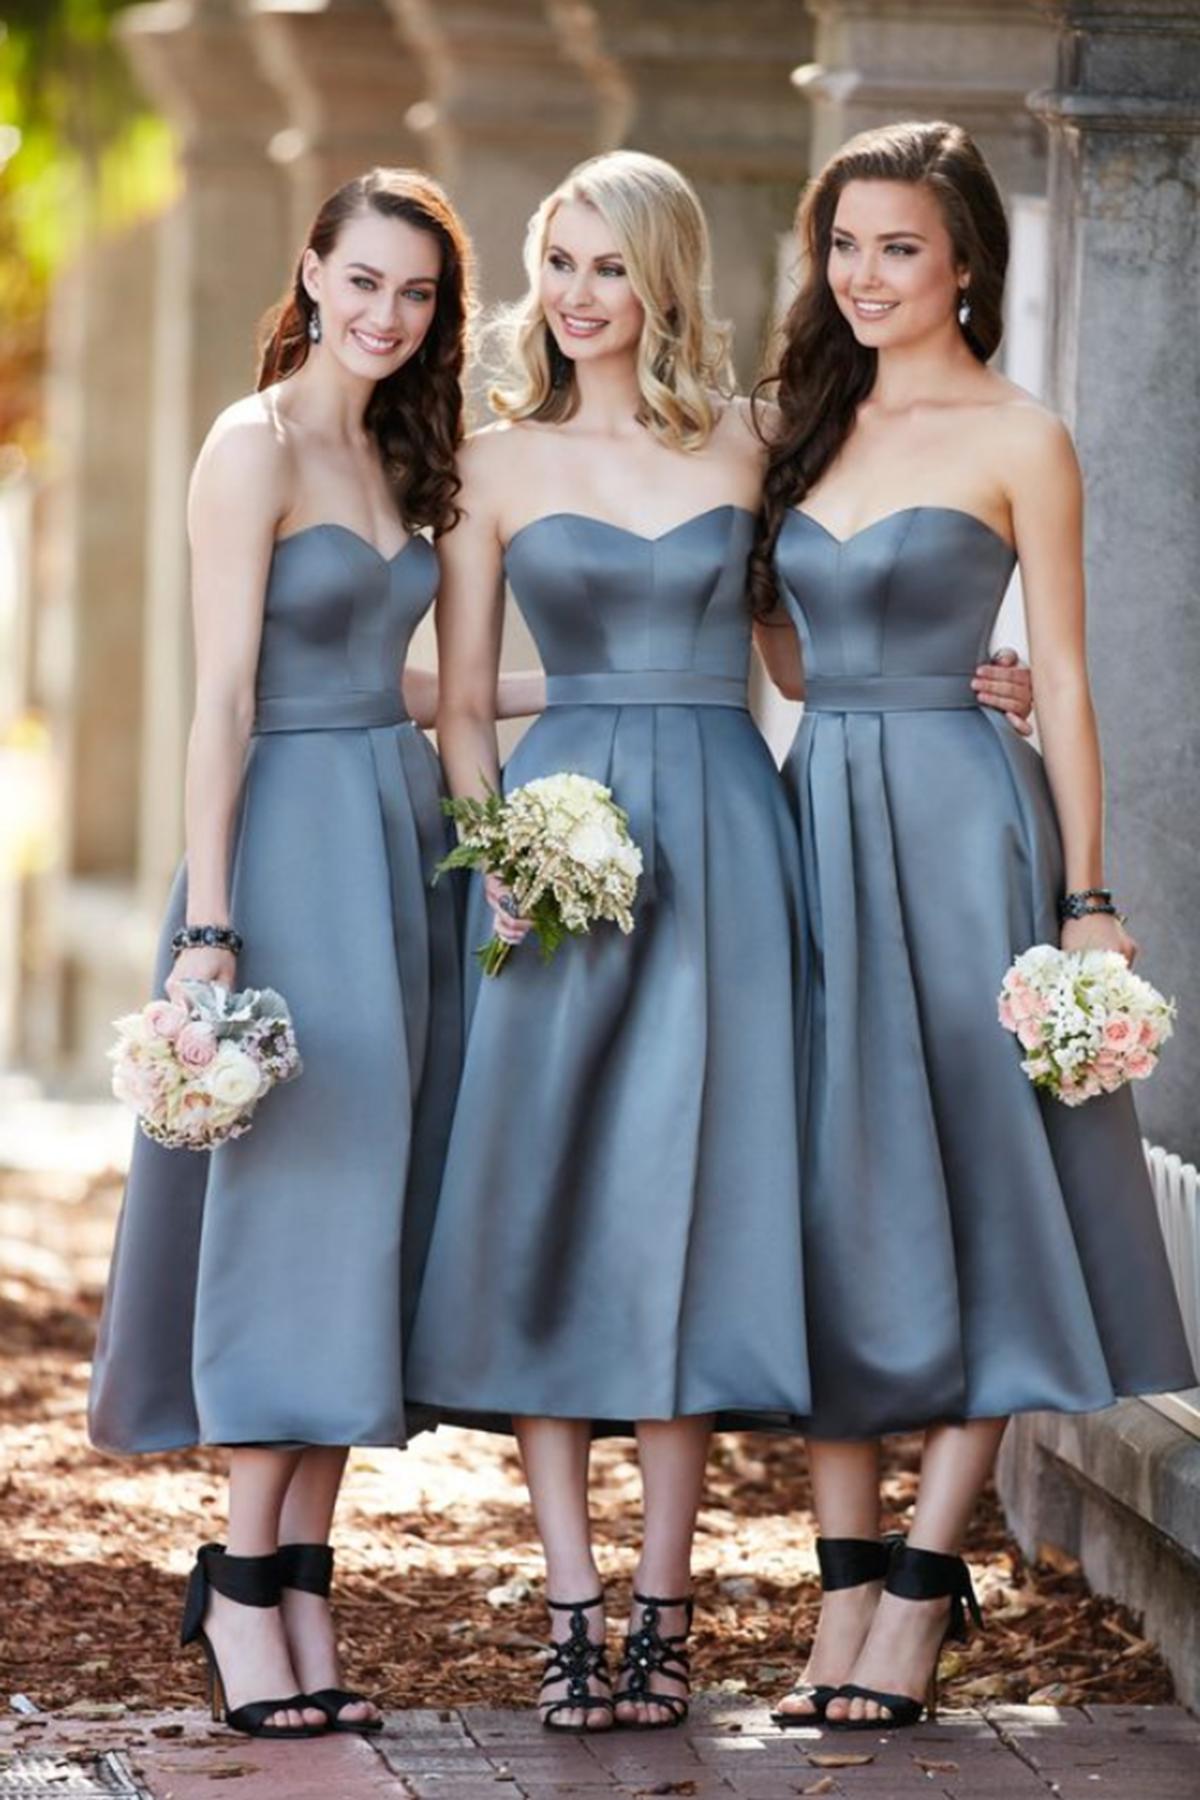 Sweetheart gray tea-length cheap bridesmaid dresses from